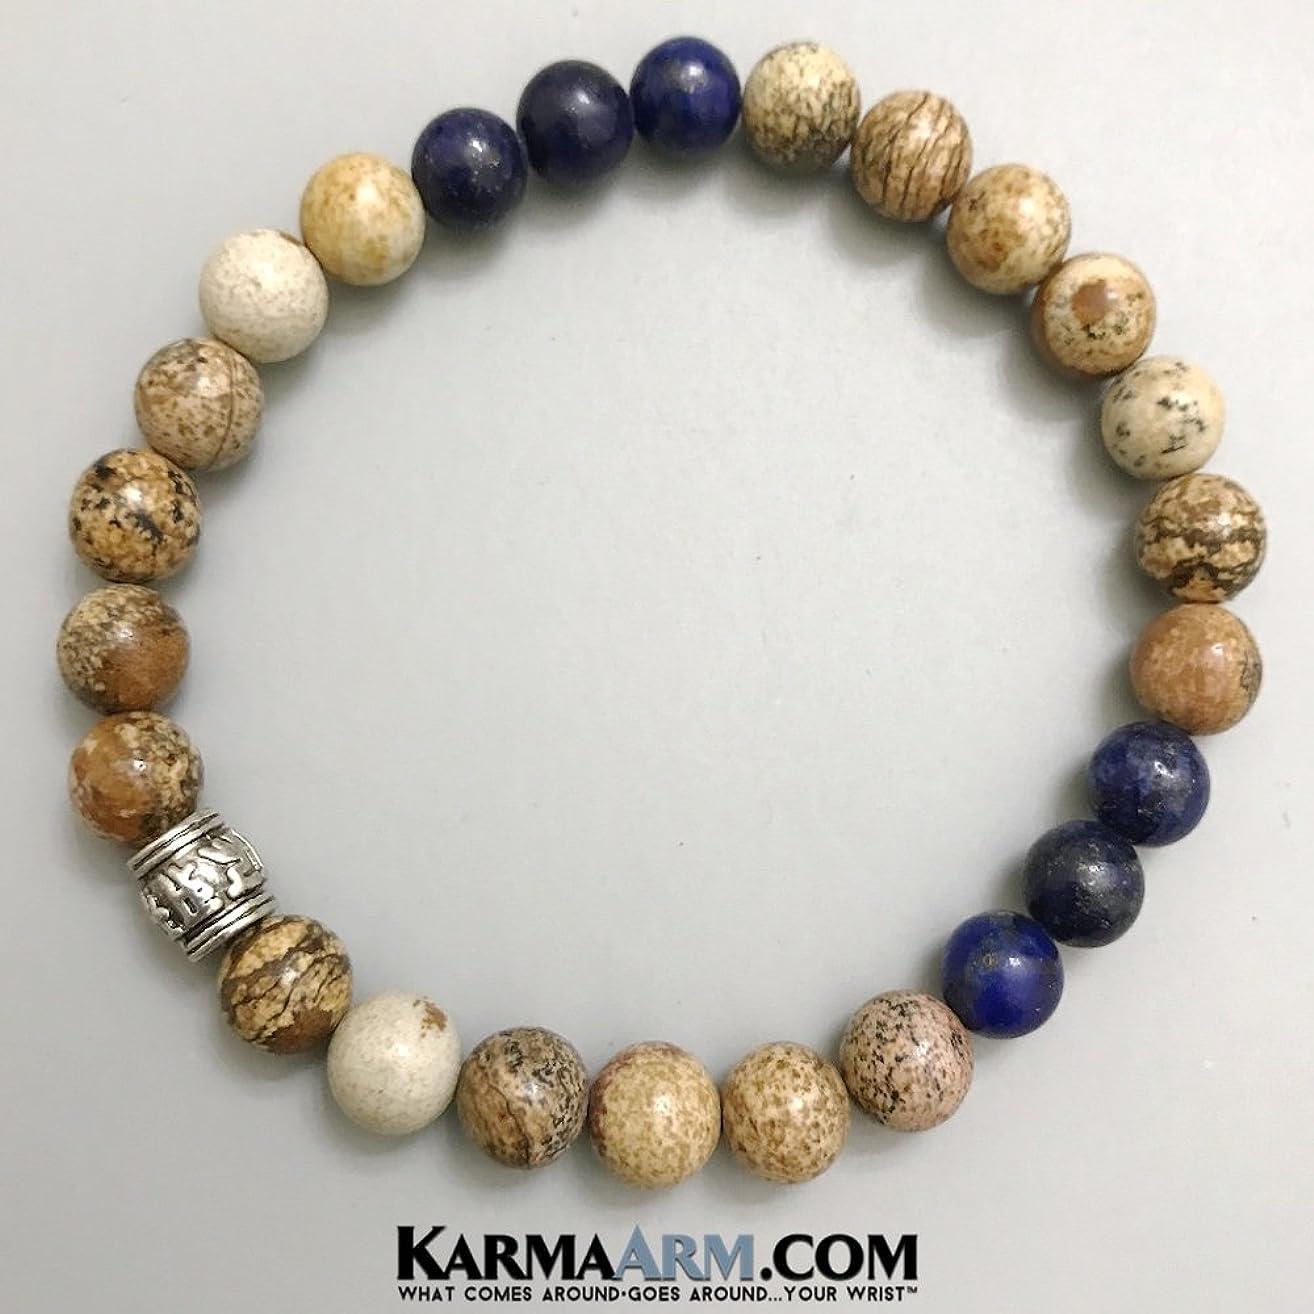 BUDDHIST MANTRA Om Mani Padme Hum Mantra Wheel: Picture Jasper   Lapis Yoga Chakra Bracelet Yoga Jewelry, Reiki Healing Bracelets Meditation Jewelry Beaded Bracelets Stretch Bracelets